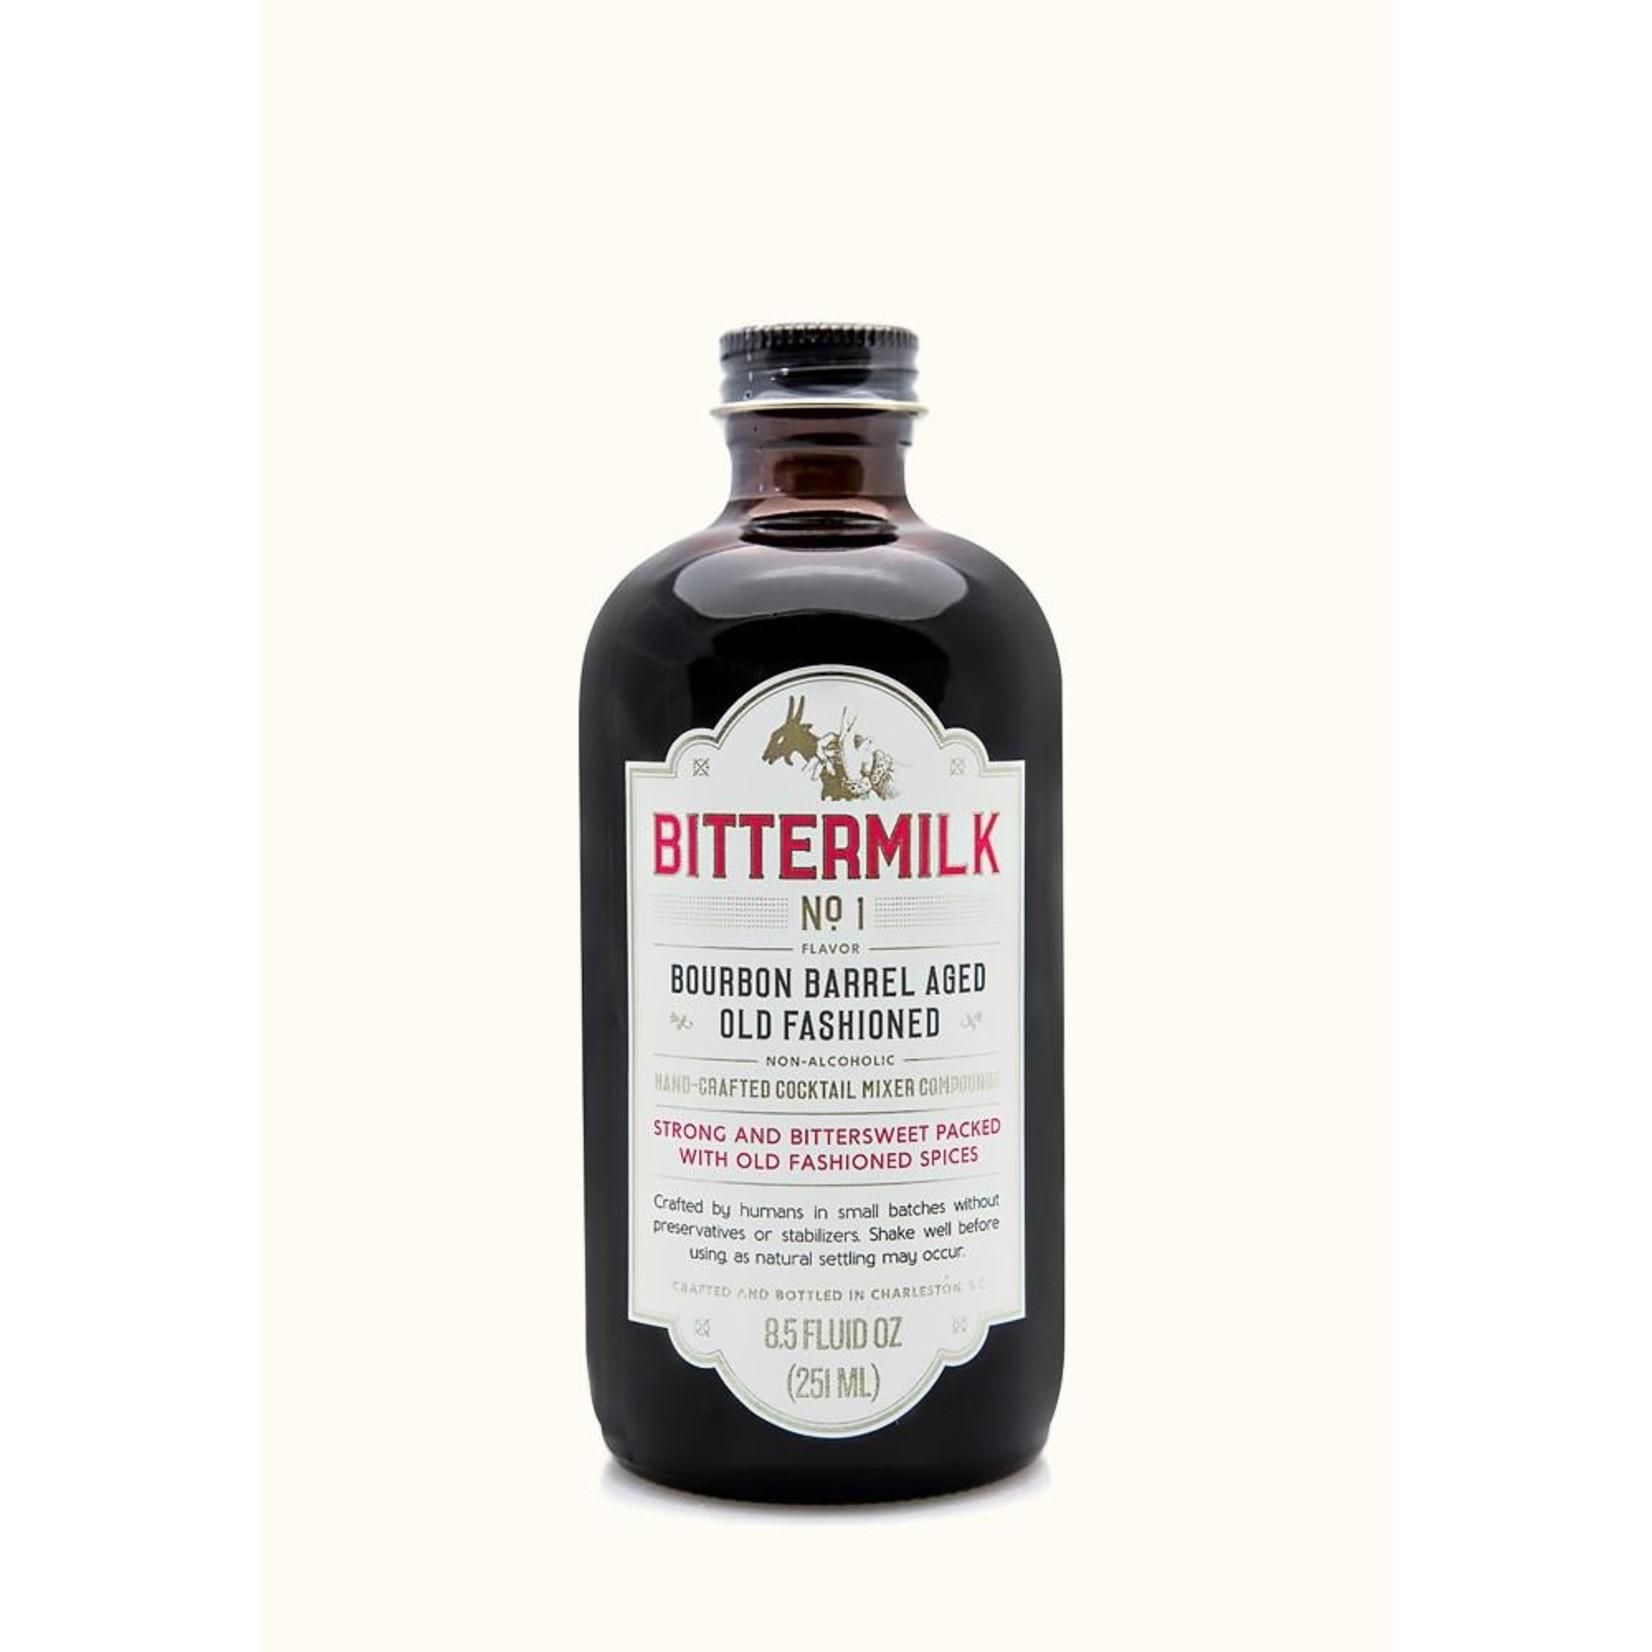 Bittermilk No. - Bourbon Barrel Aged Old Fashioned